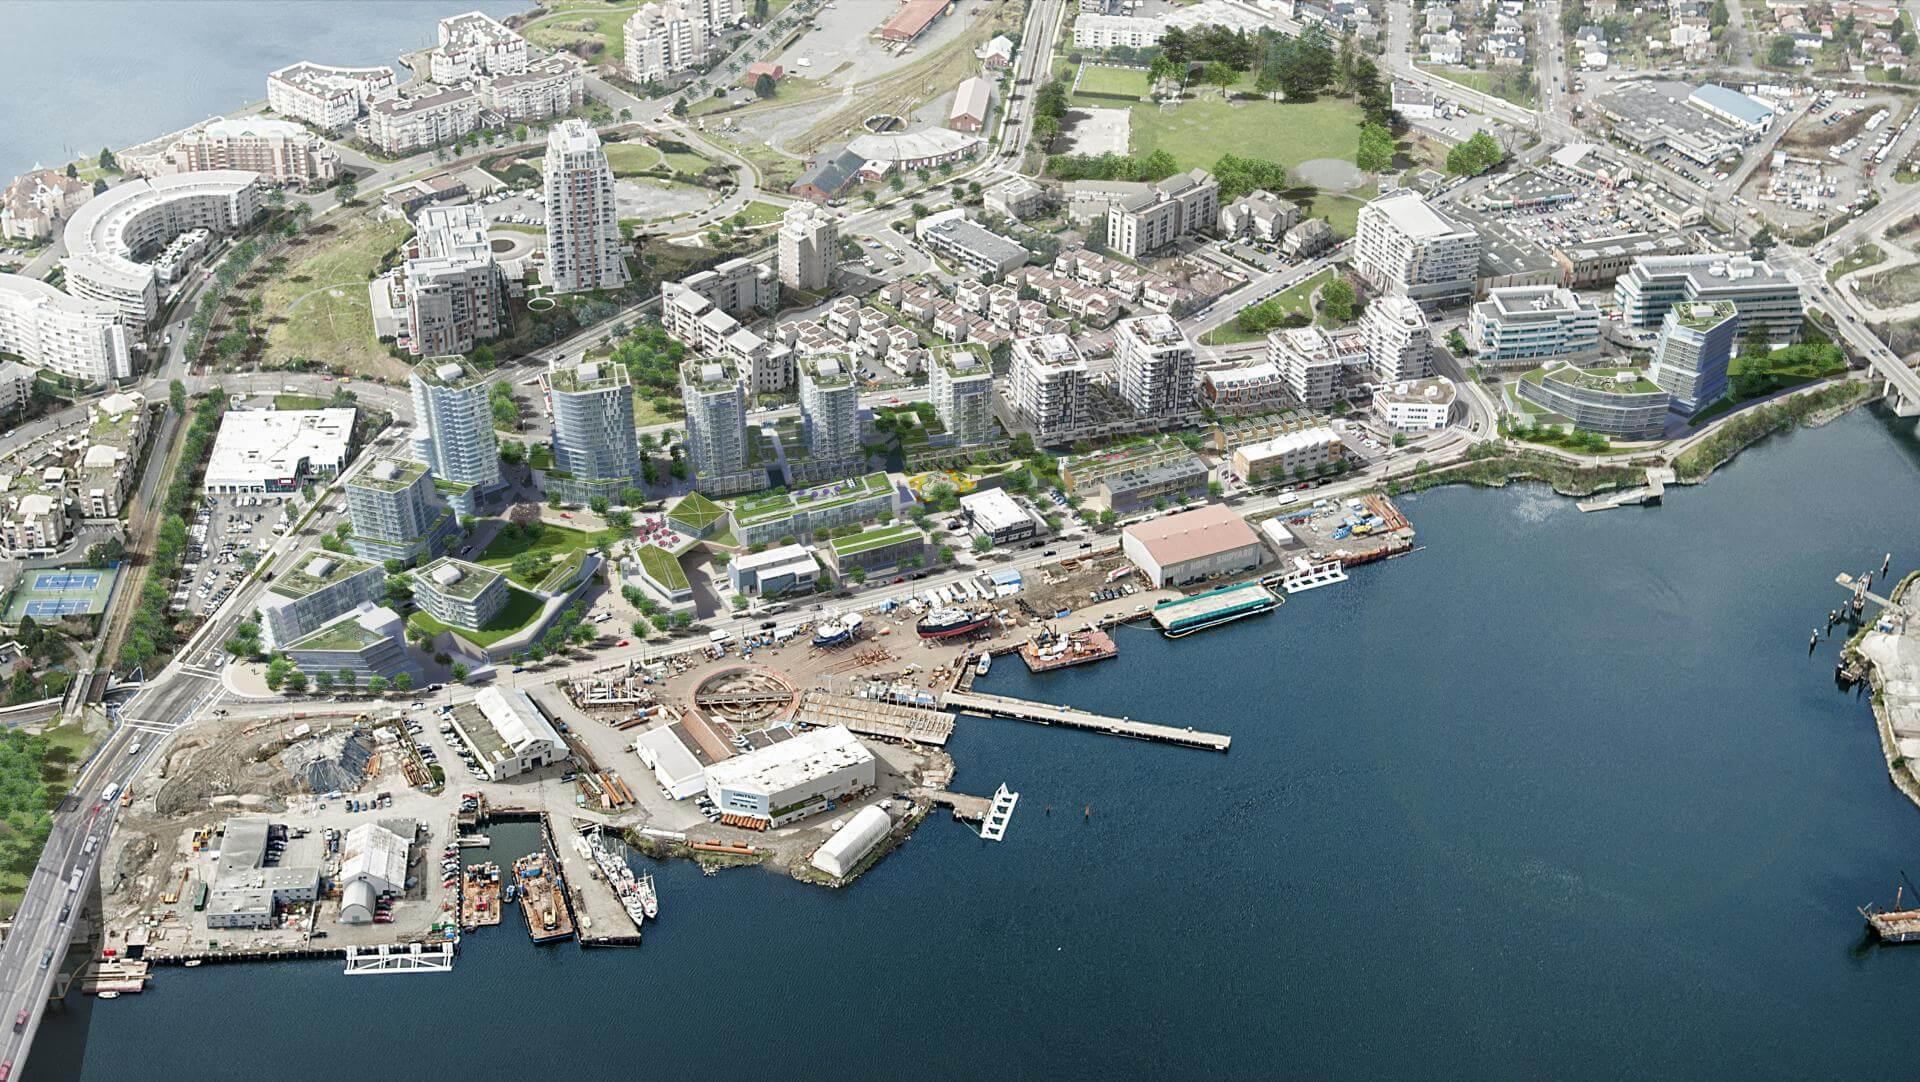 Rendering Of Dockside Green 15-acre Development Aerial View